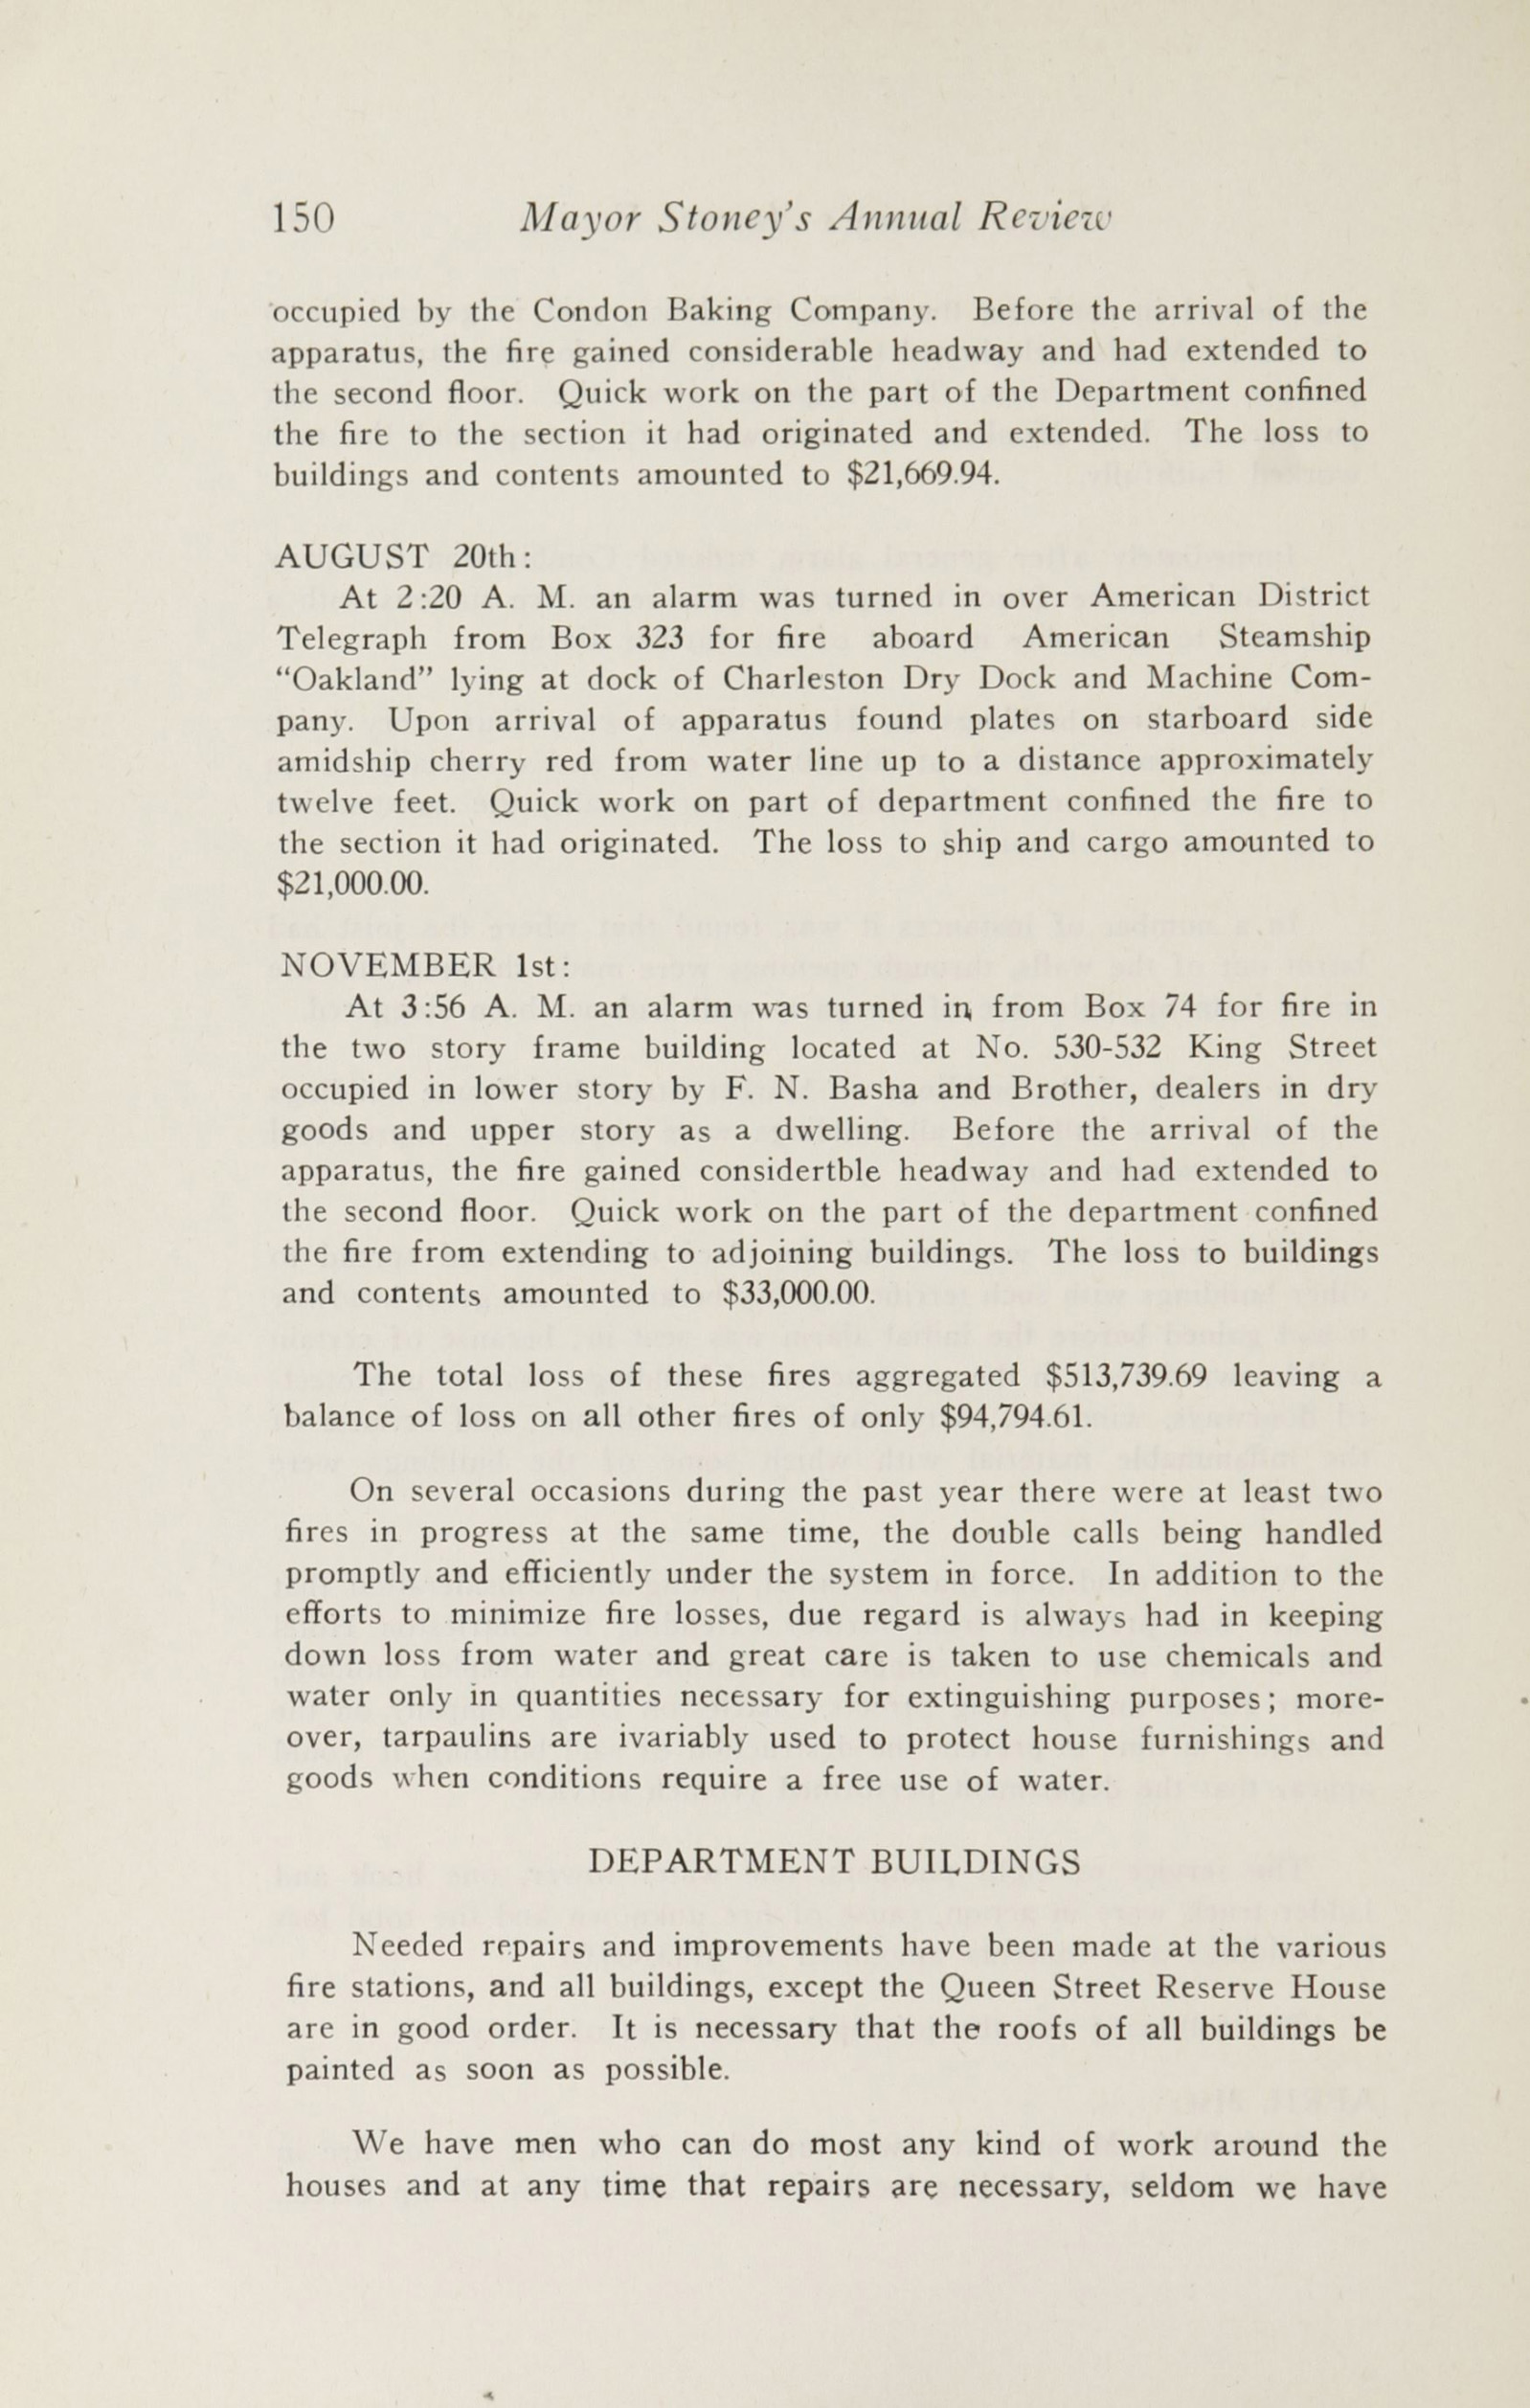 Charleston Yearbook, 1927, page 150